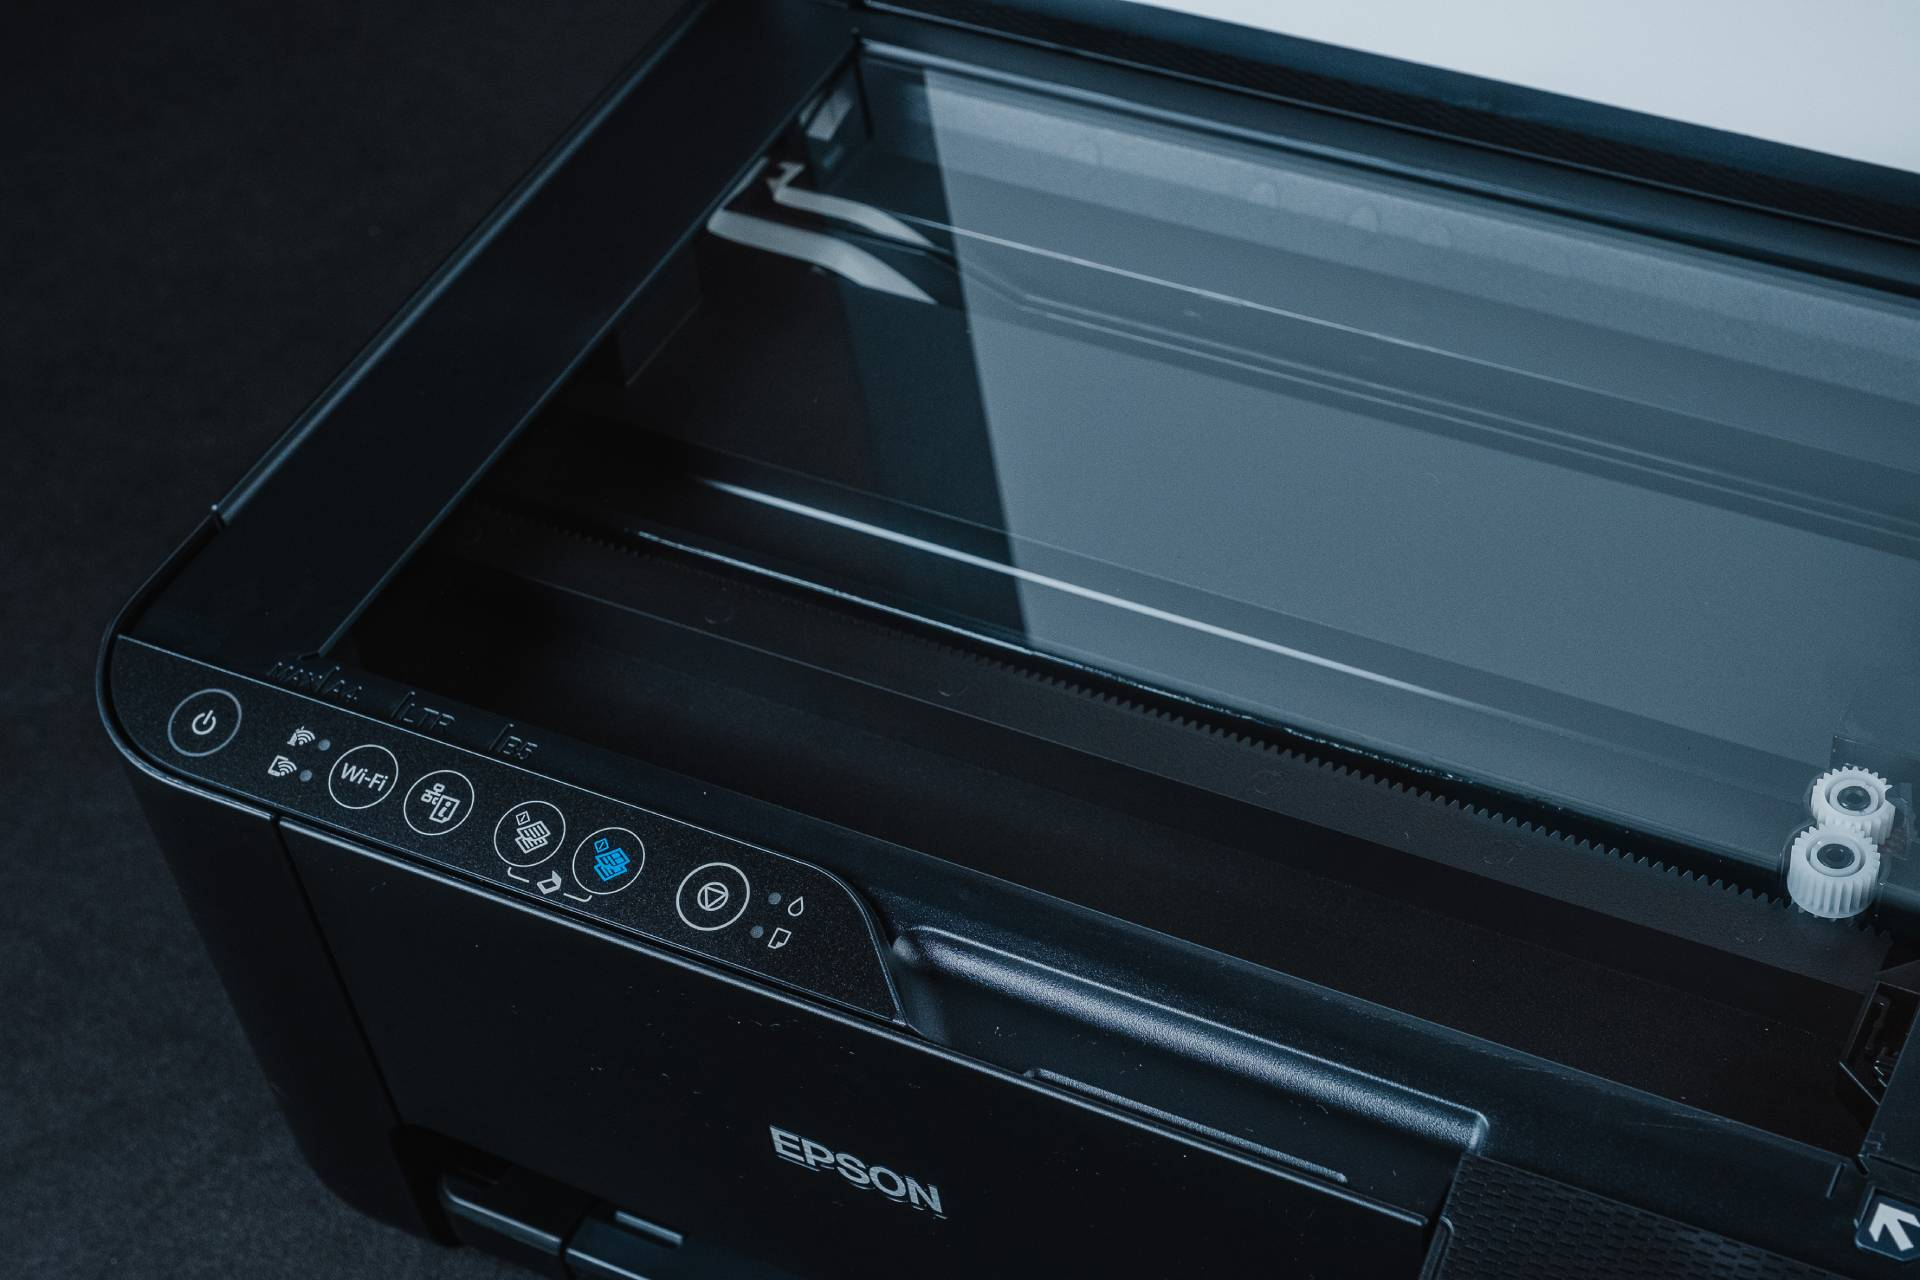 Impressora Epson Ecotank L3150 preta com tampa aberta, mostrando painel e vidro de cópia e scan